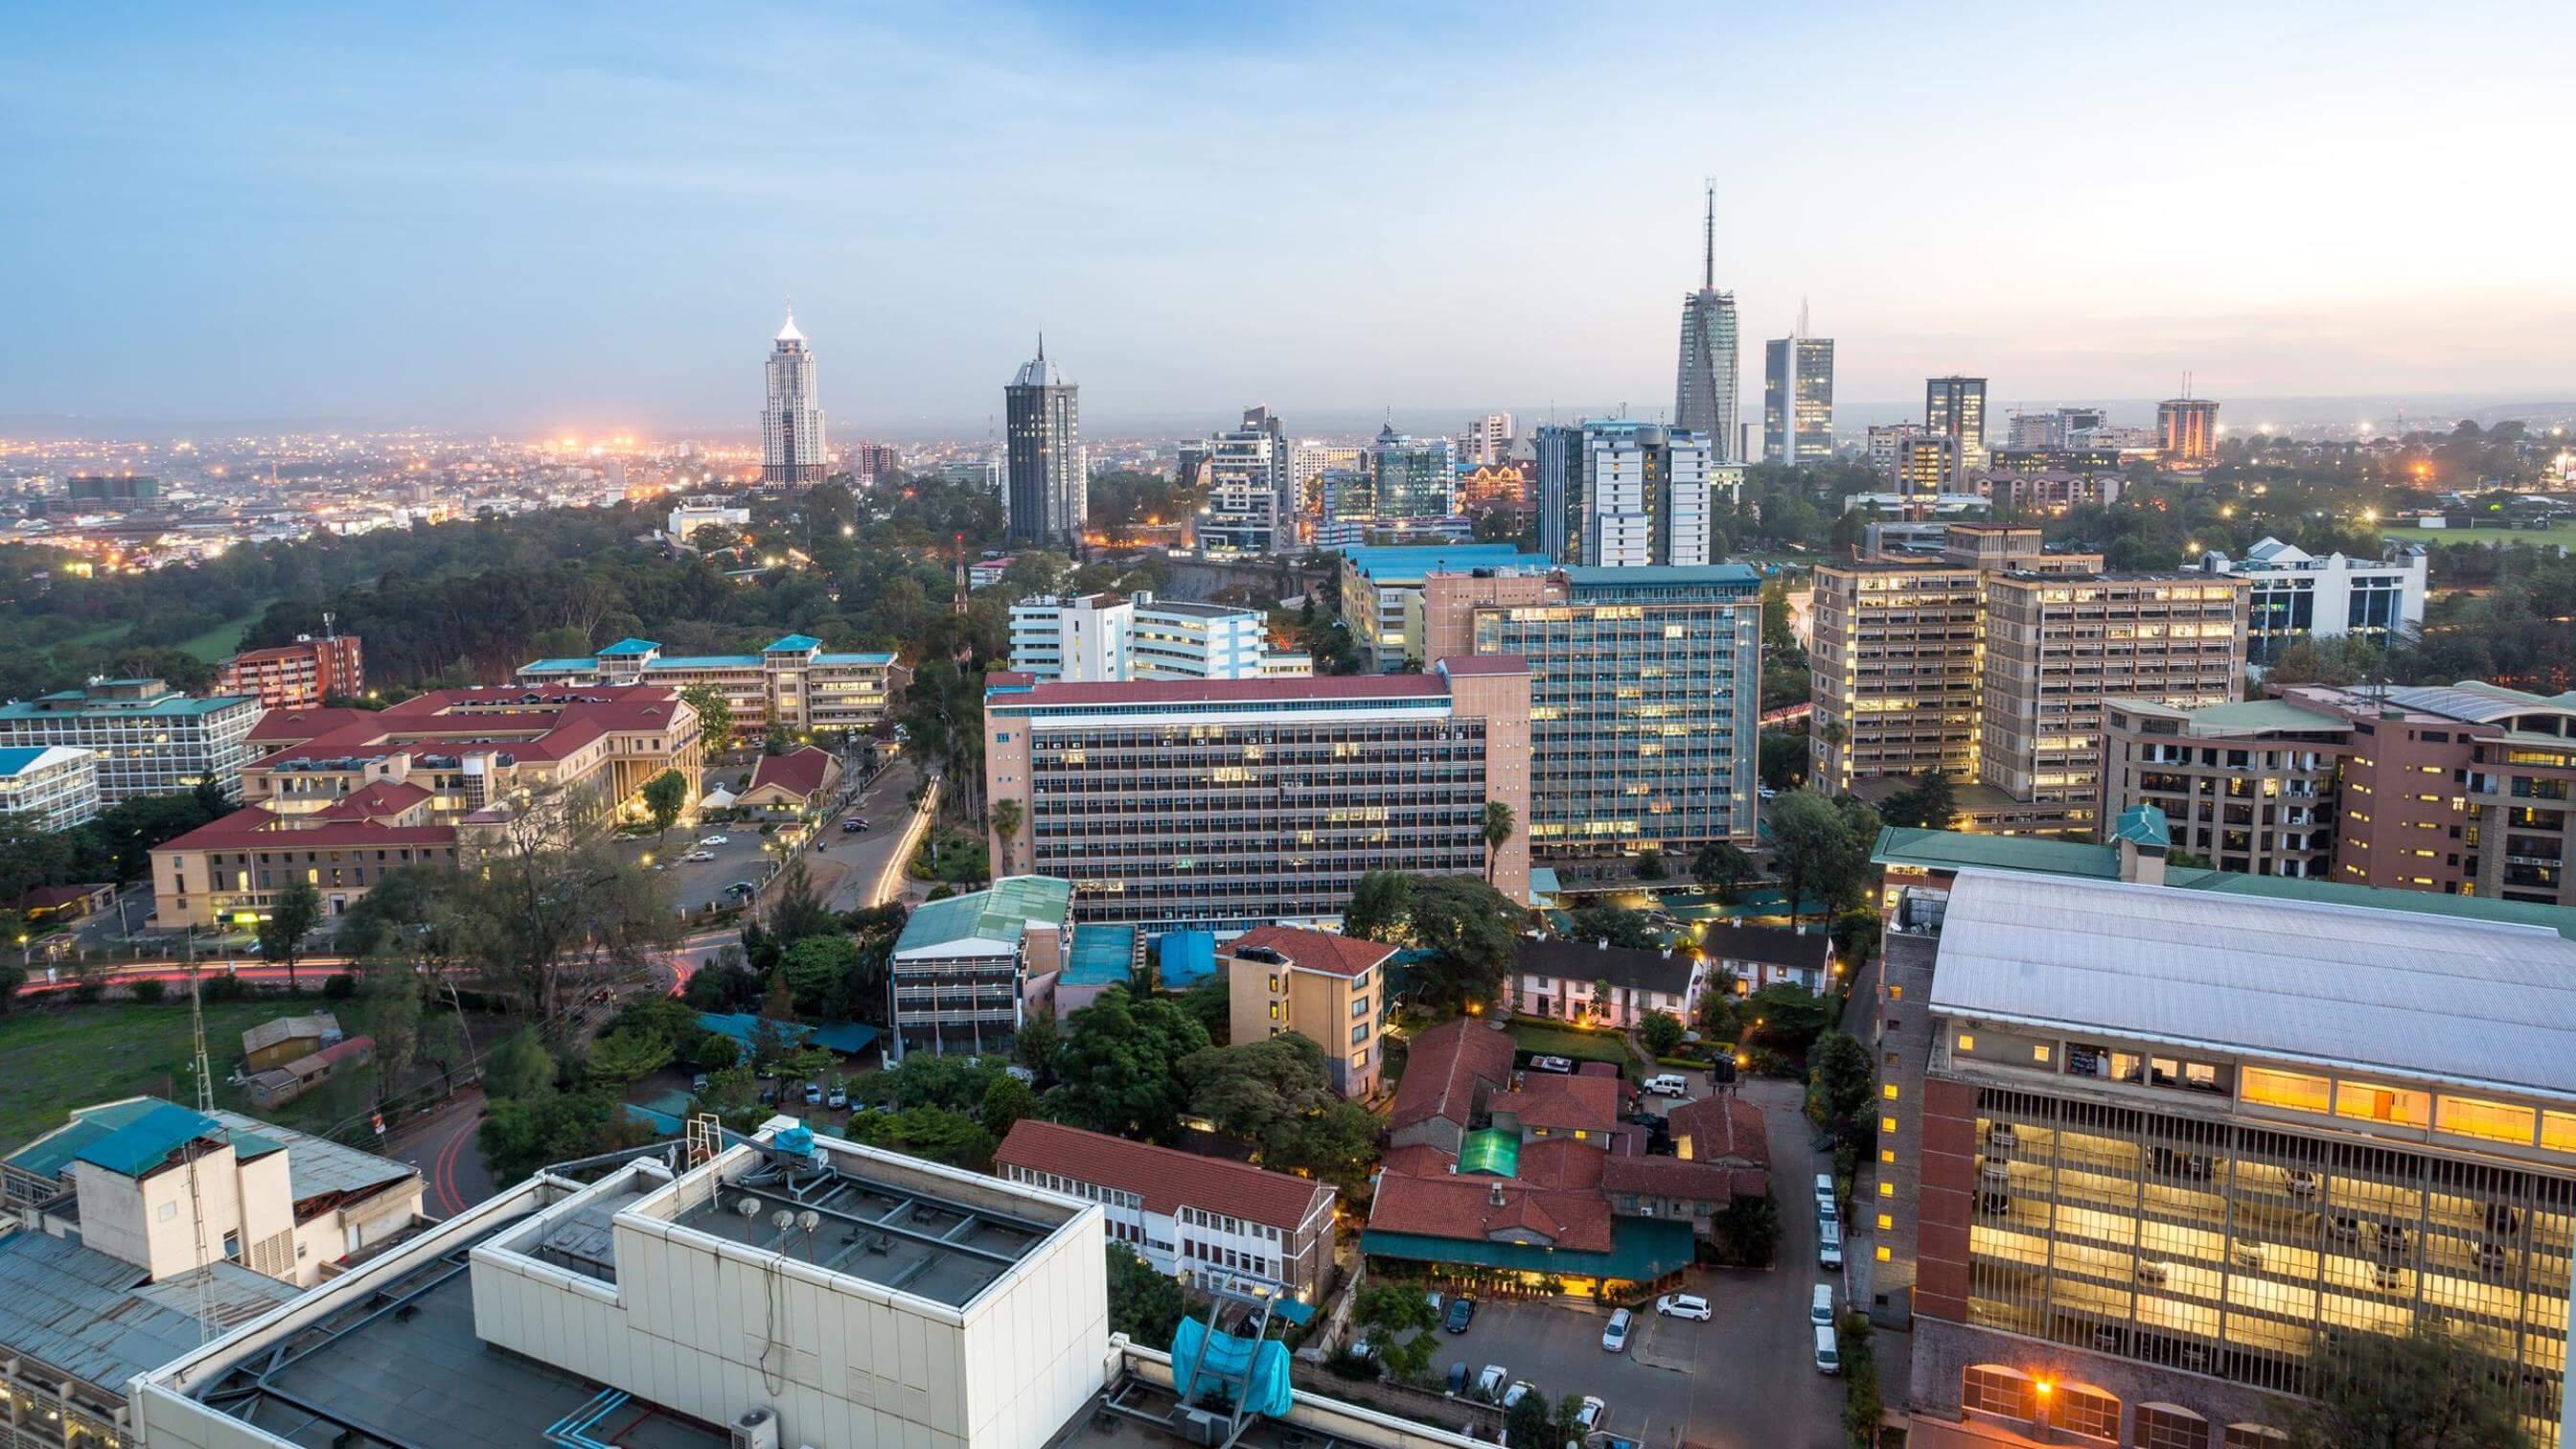 Kenya power plant boosts economy | Aggreko